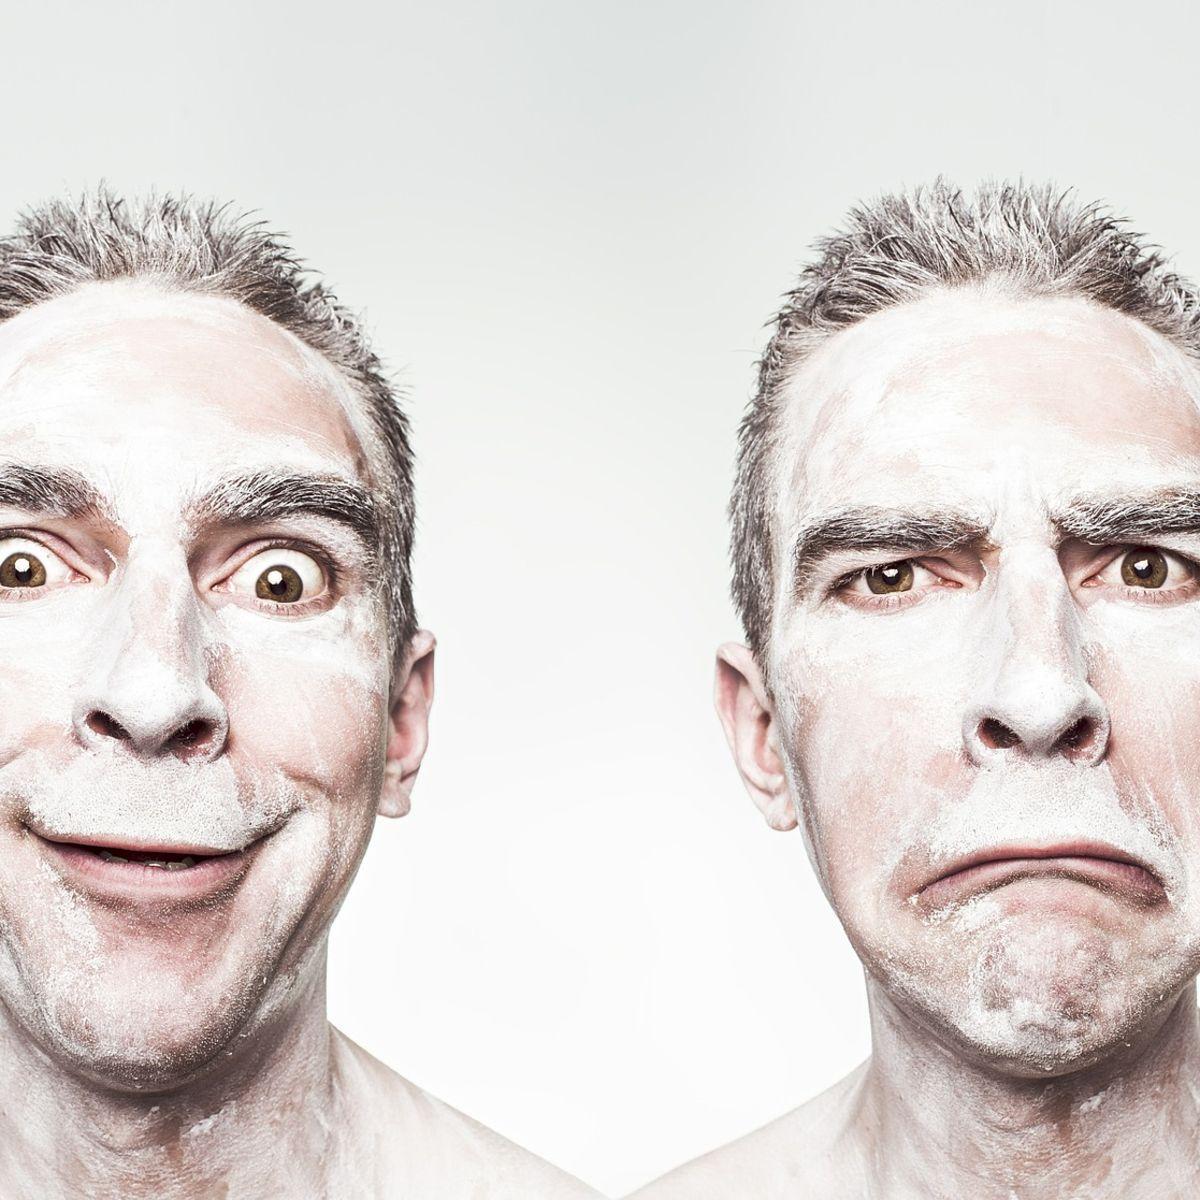 Happy vs. Sad: Emotions on a man's face.